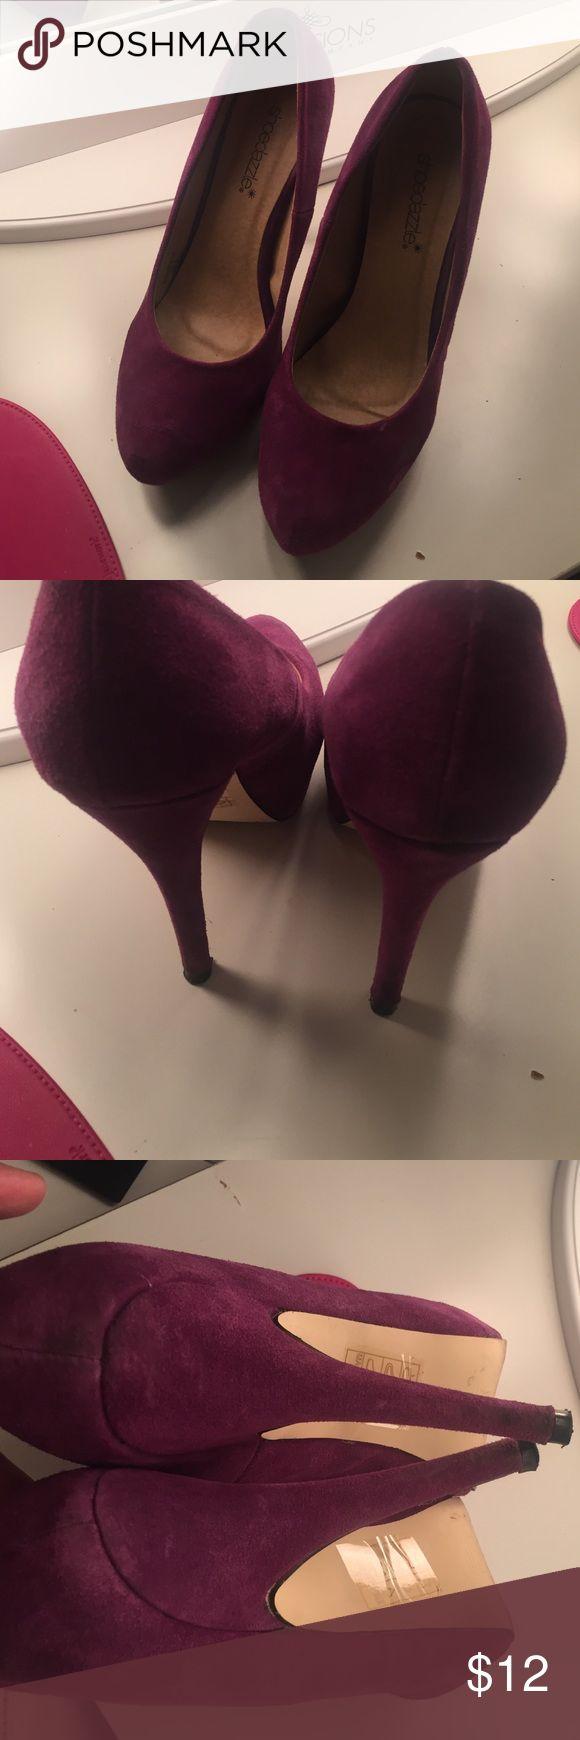 Purple Pumps by Shoe Dazzle, sz 8 Sexy Shoe Dazzle heels, size 8. All imperfections are pictured! Shoe Dazzle Shoes Heels